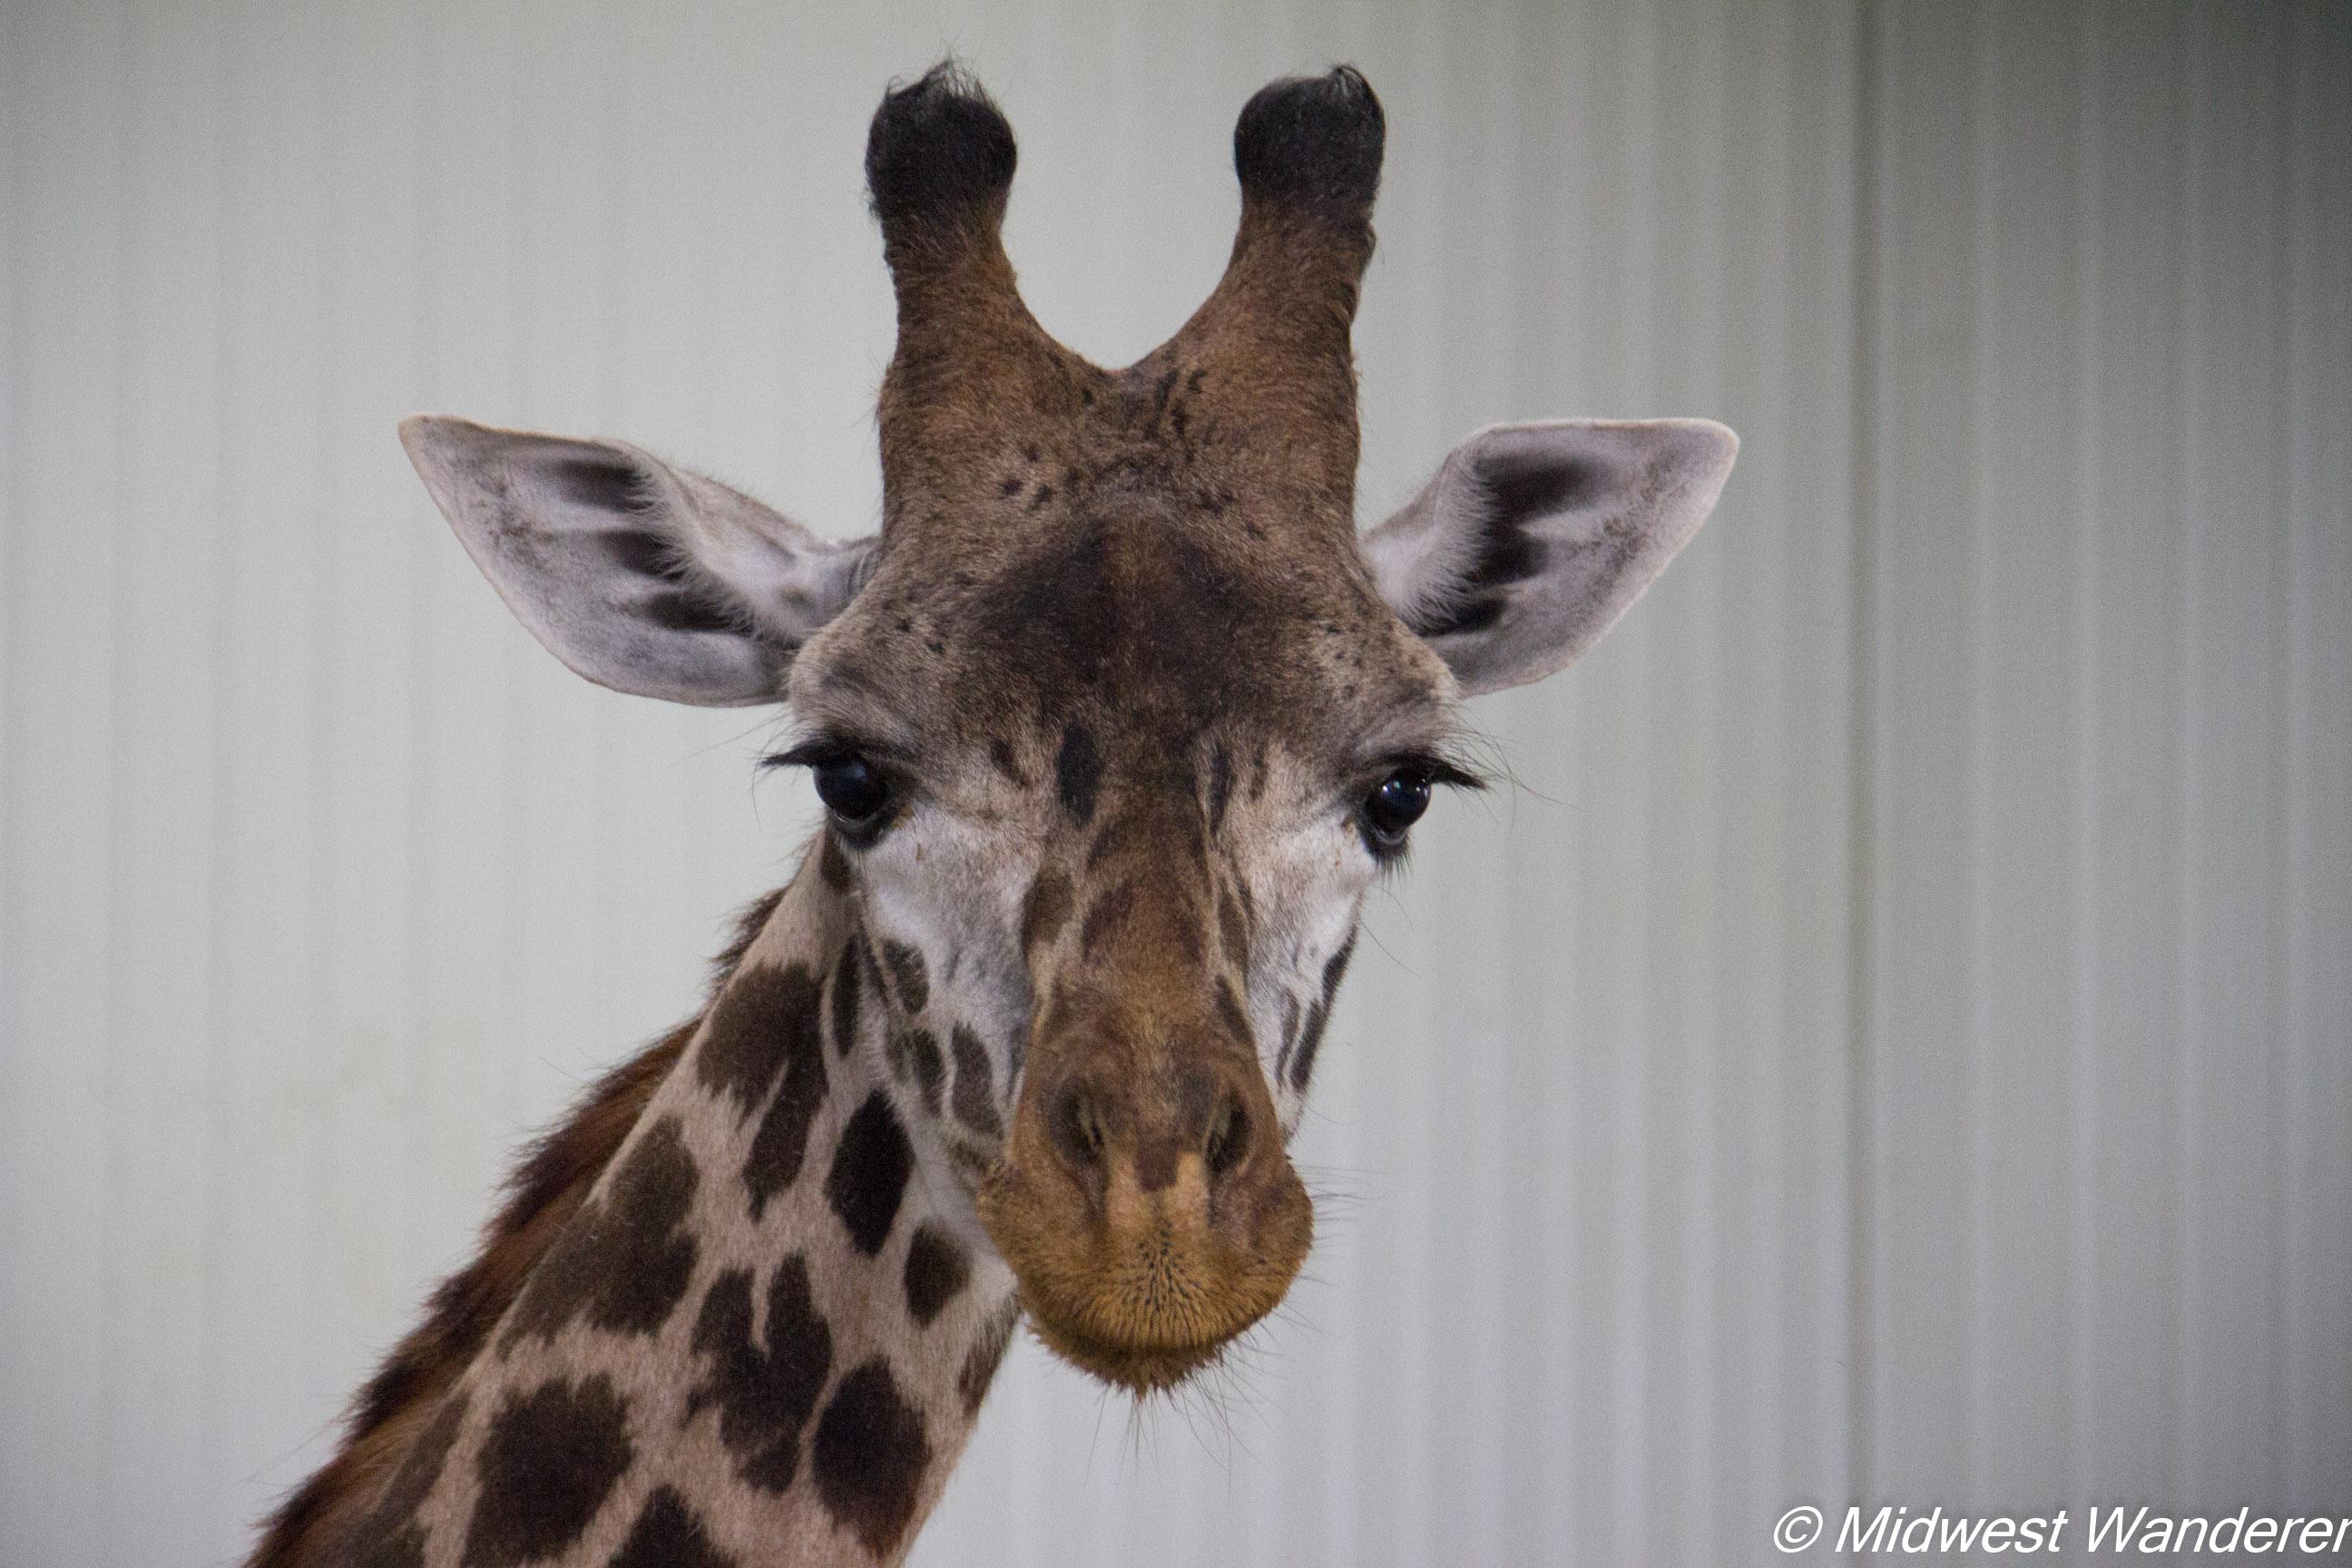 Wilstem Ranch Giraffe Encounter 4